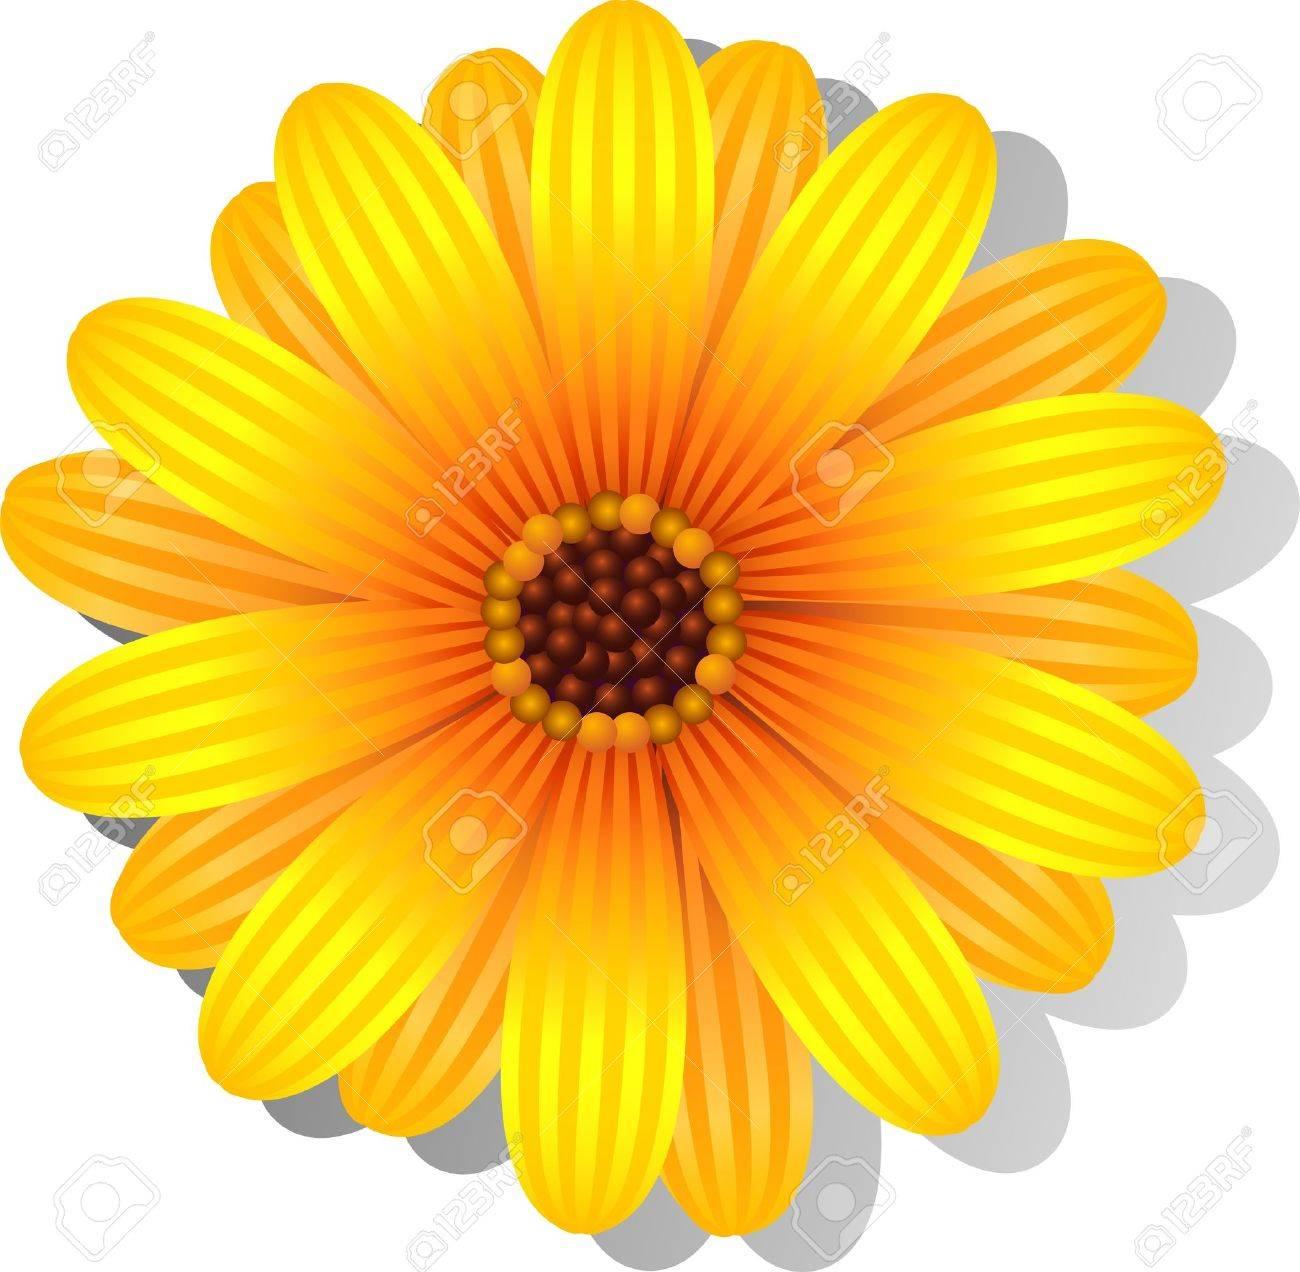 Gerber Daisy Cliparts, Stock Vector And Royalty Free Gerber Daisy ...